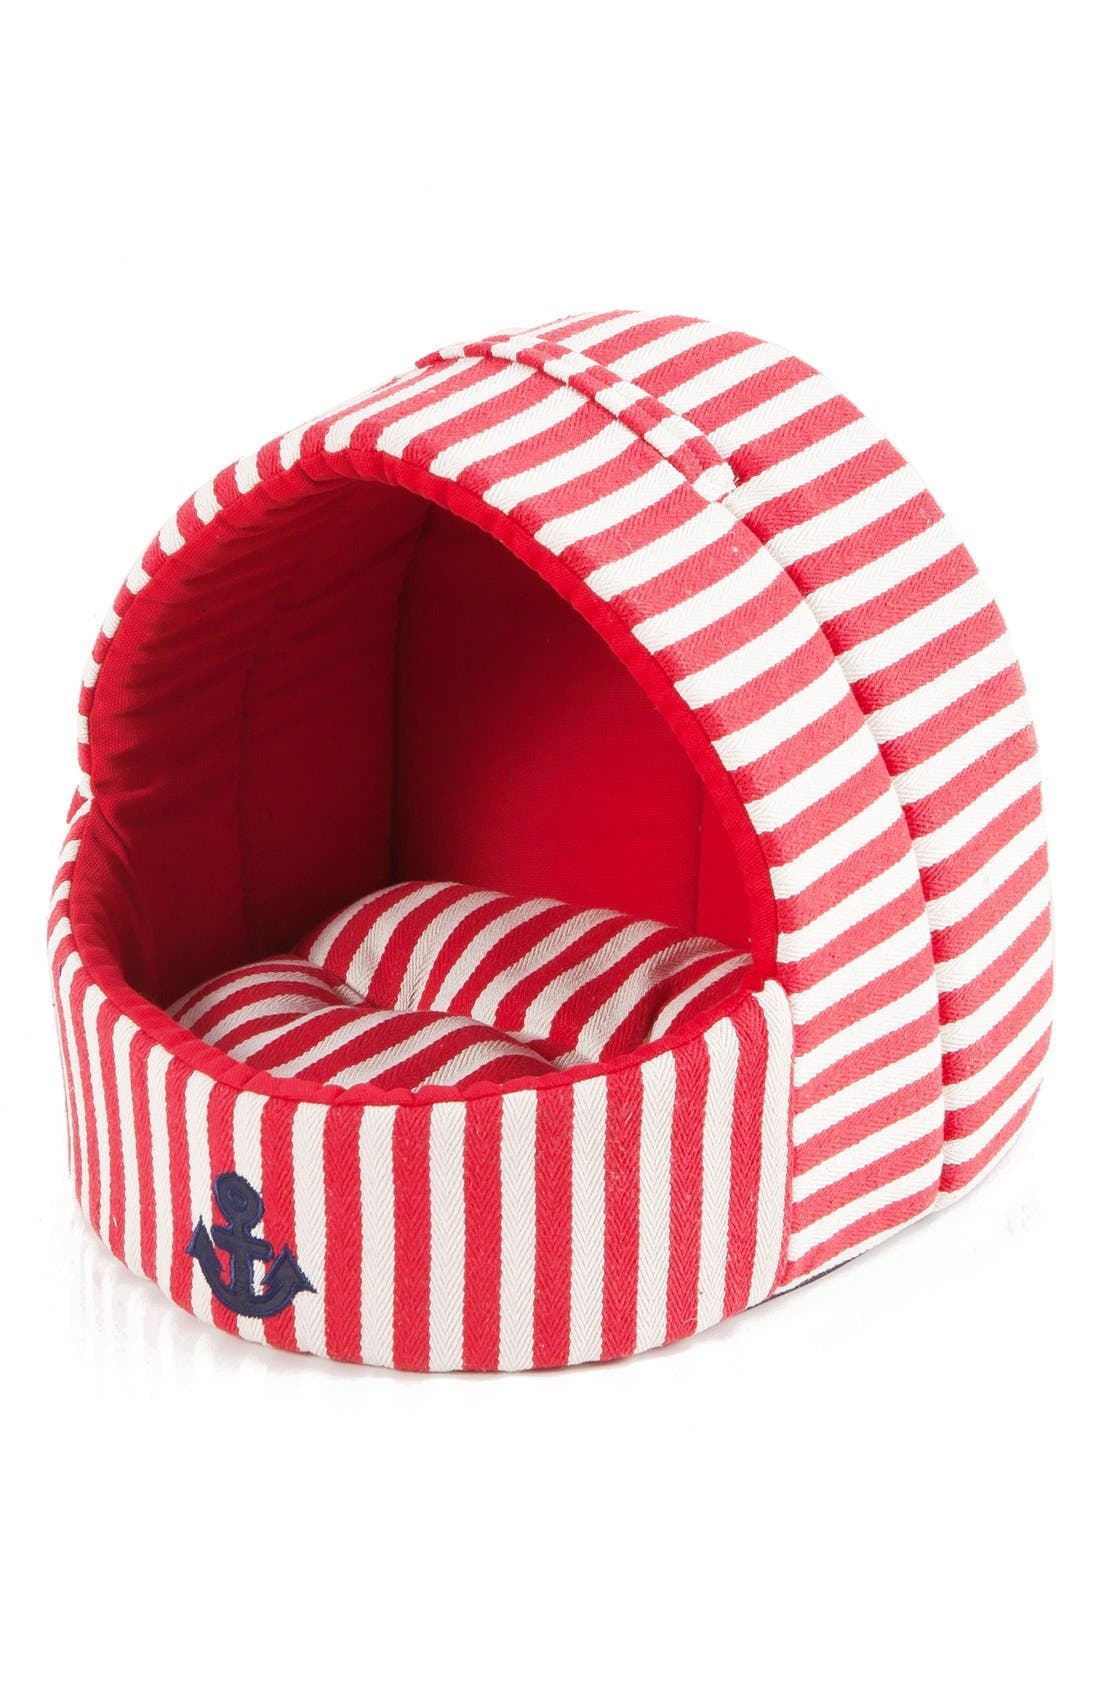 Dante Stripe Pet House,                         Main,                         color, Red